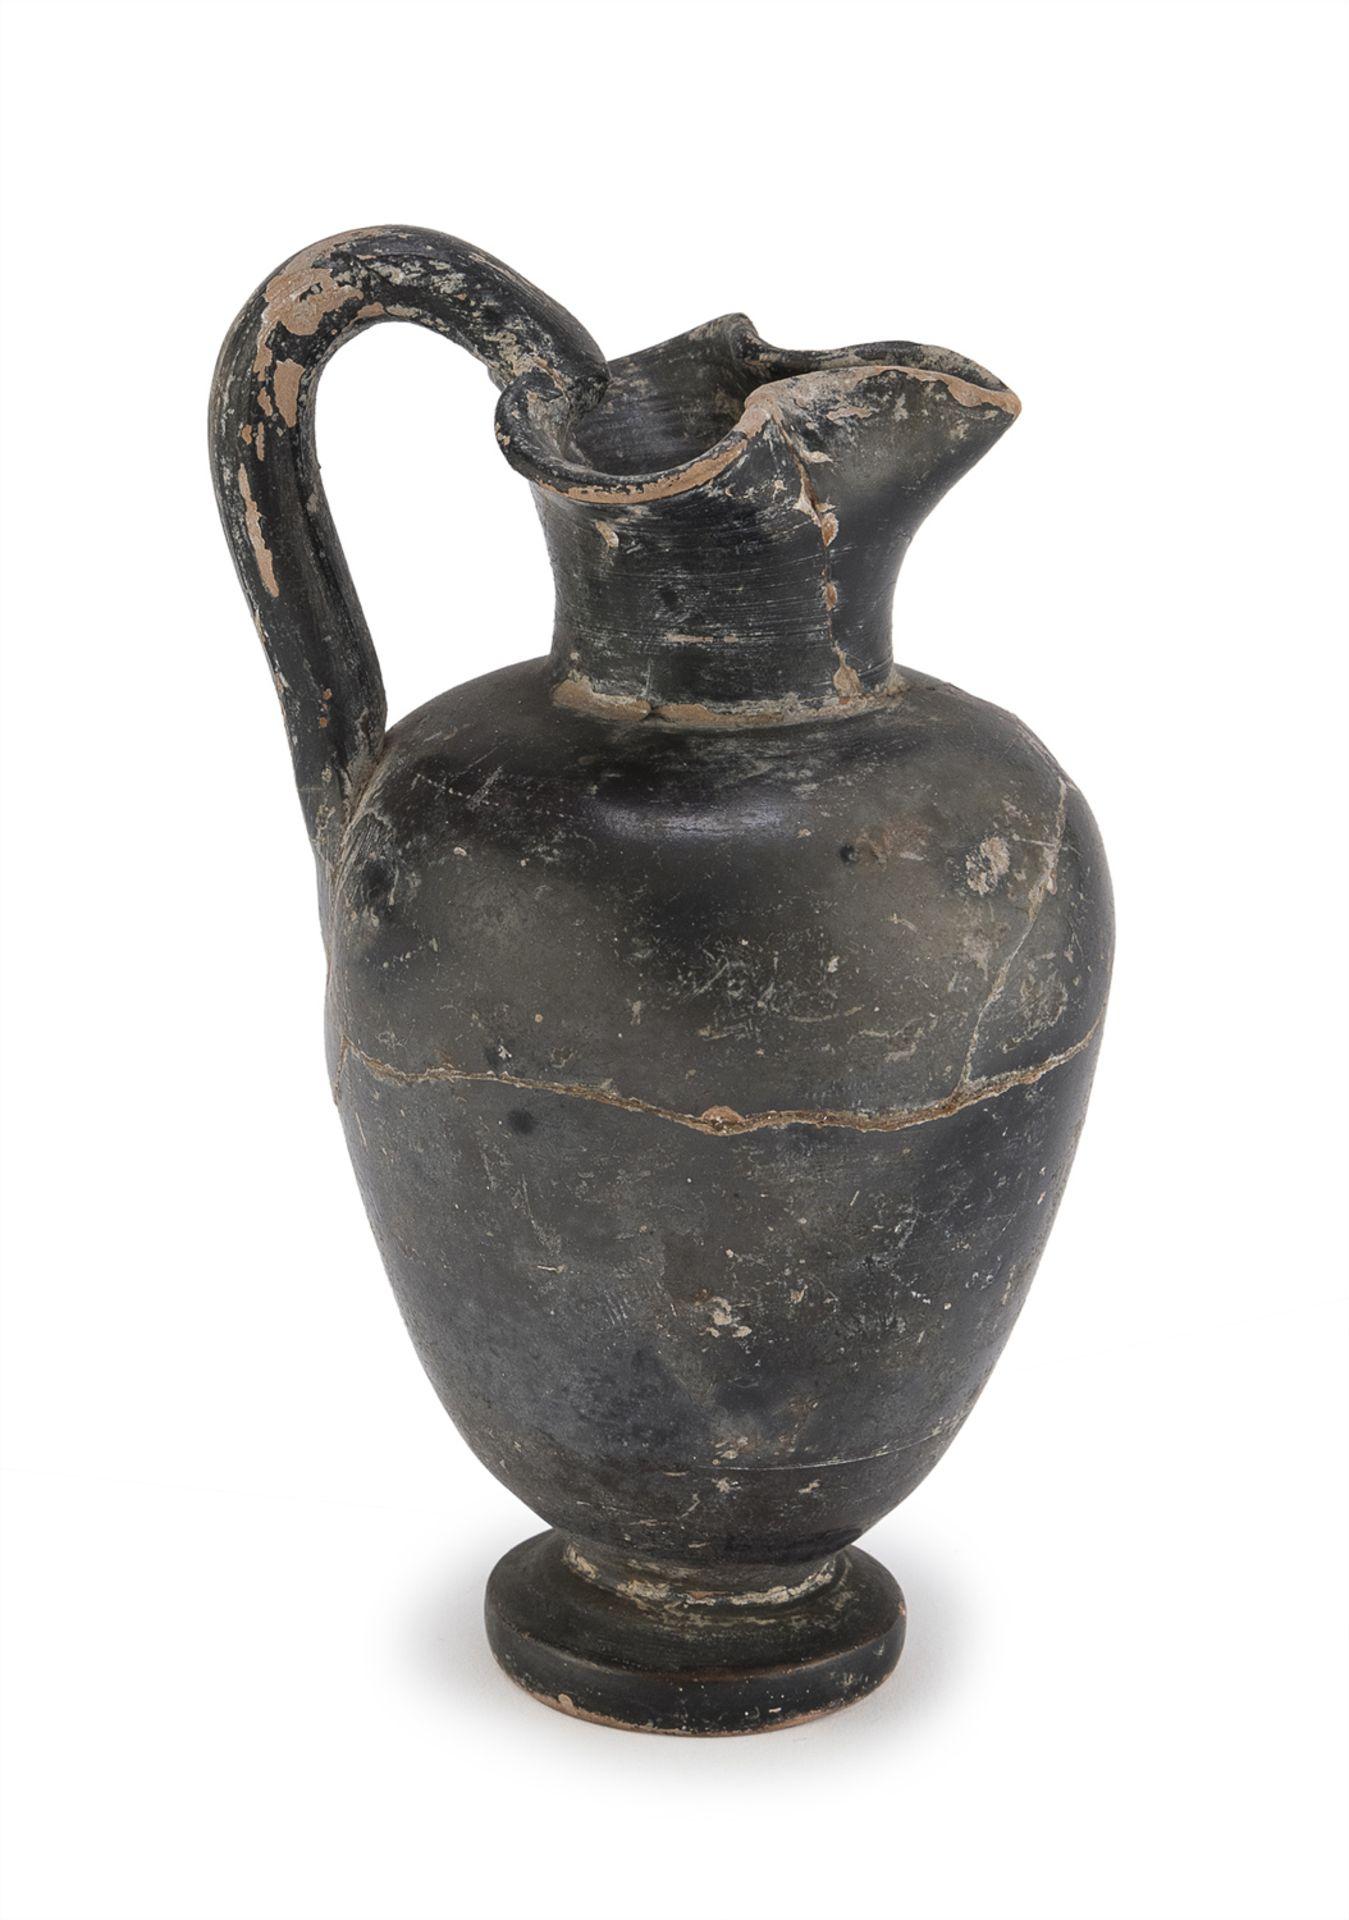 BLACK-FIGURED APULIAN OINOCHOE 4th-3rd CENTURY BC